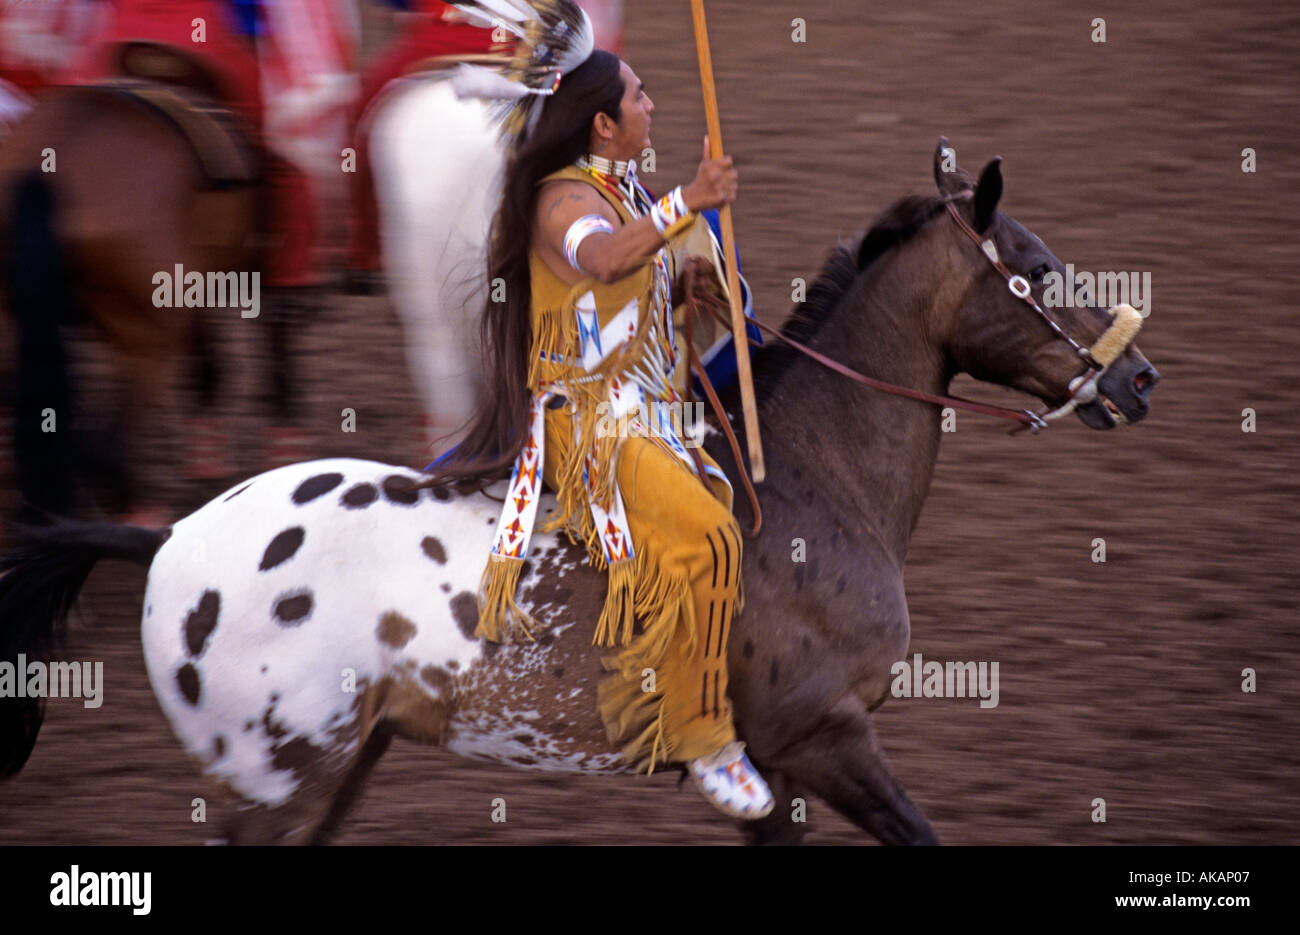 Native Indian riding display at Rodeo Vernal Utah in USA - Stock Image